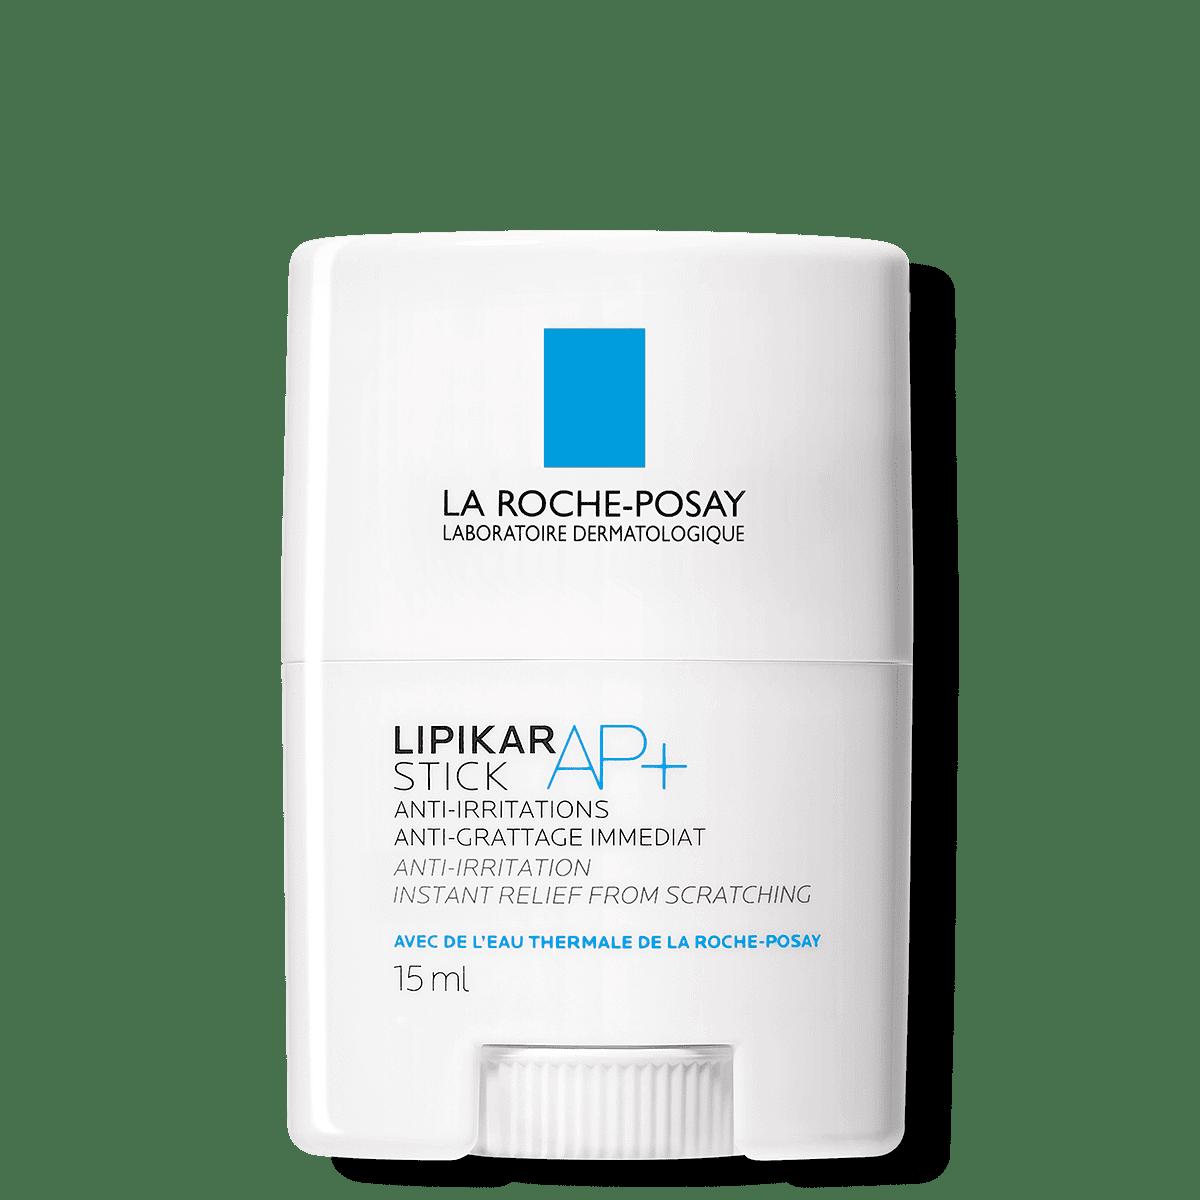 La Roche Posay Body Care Lipikar Stick AP 15ml Irritation Scratching E